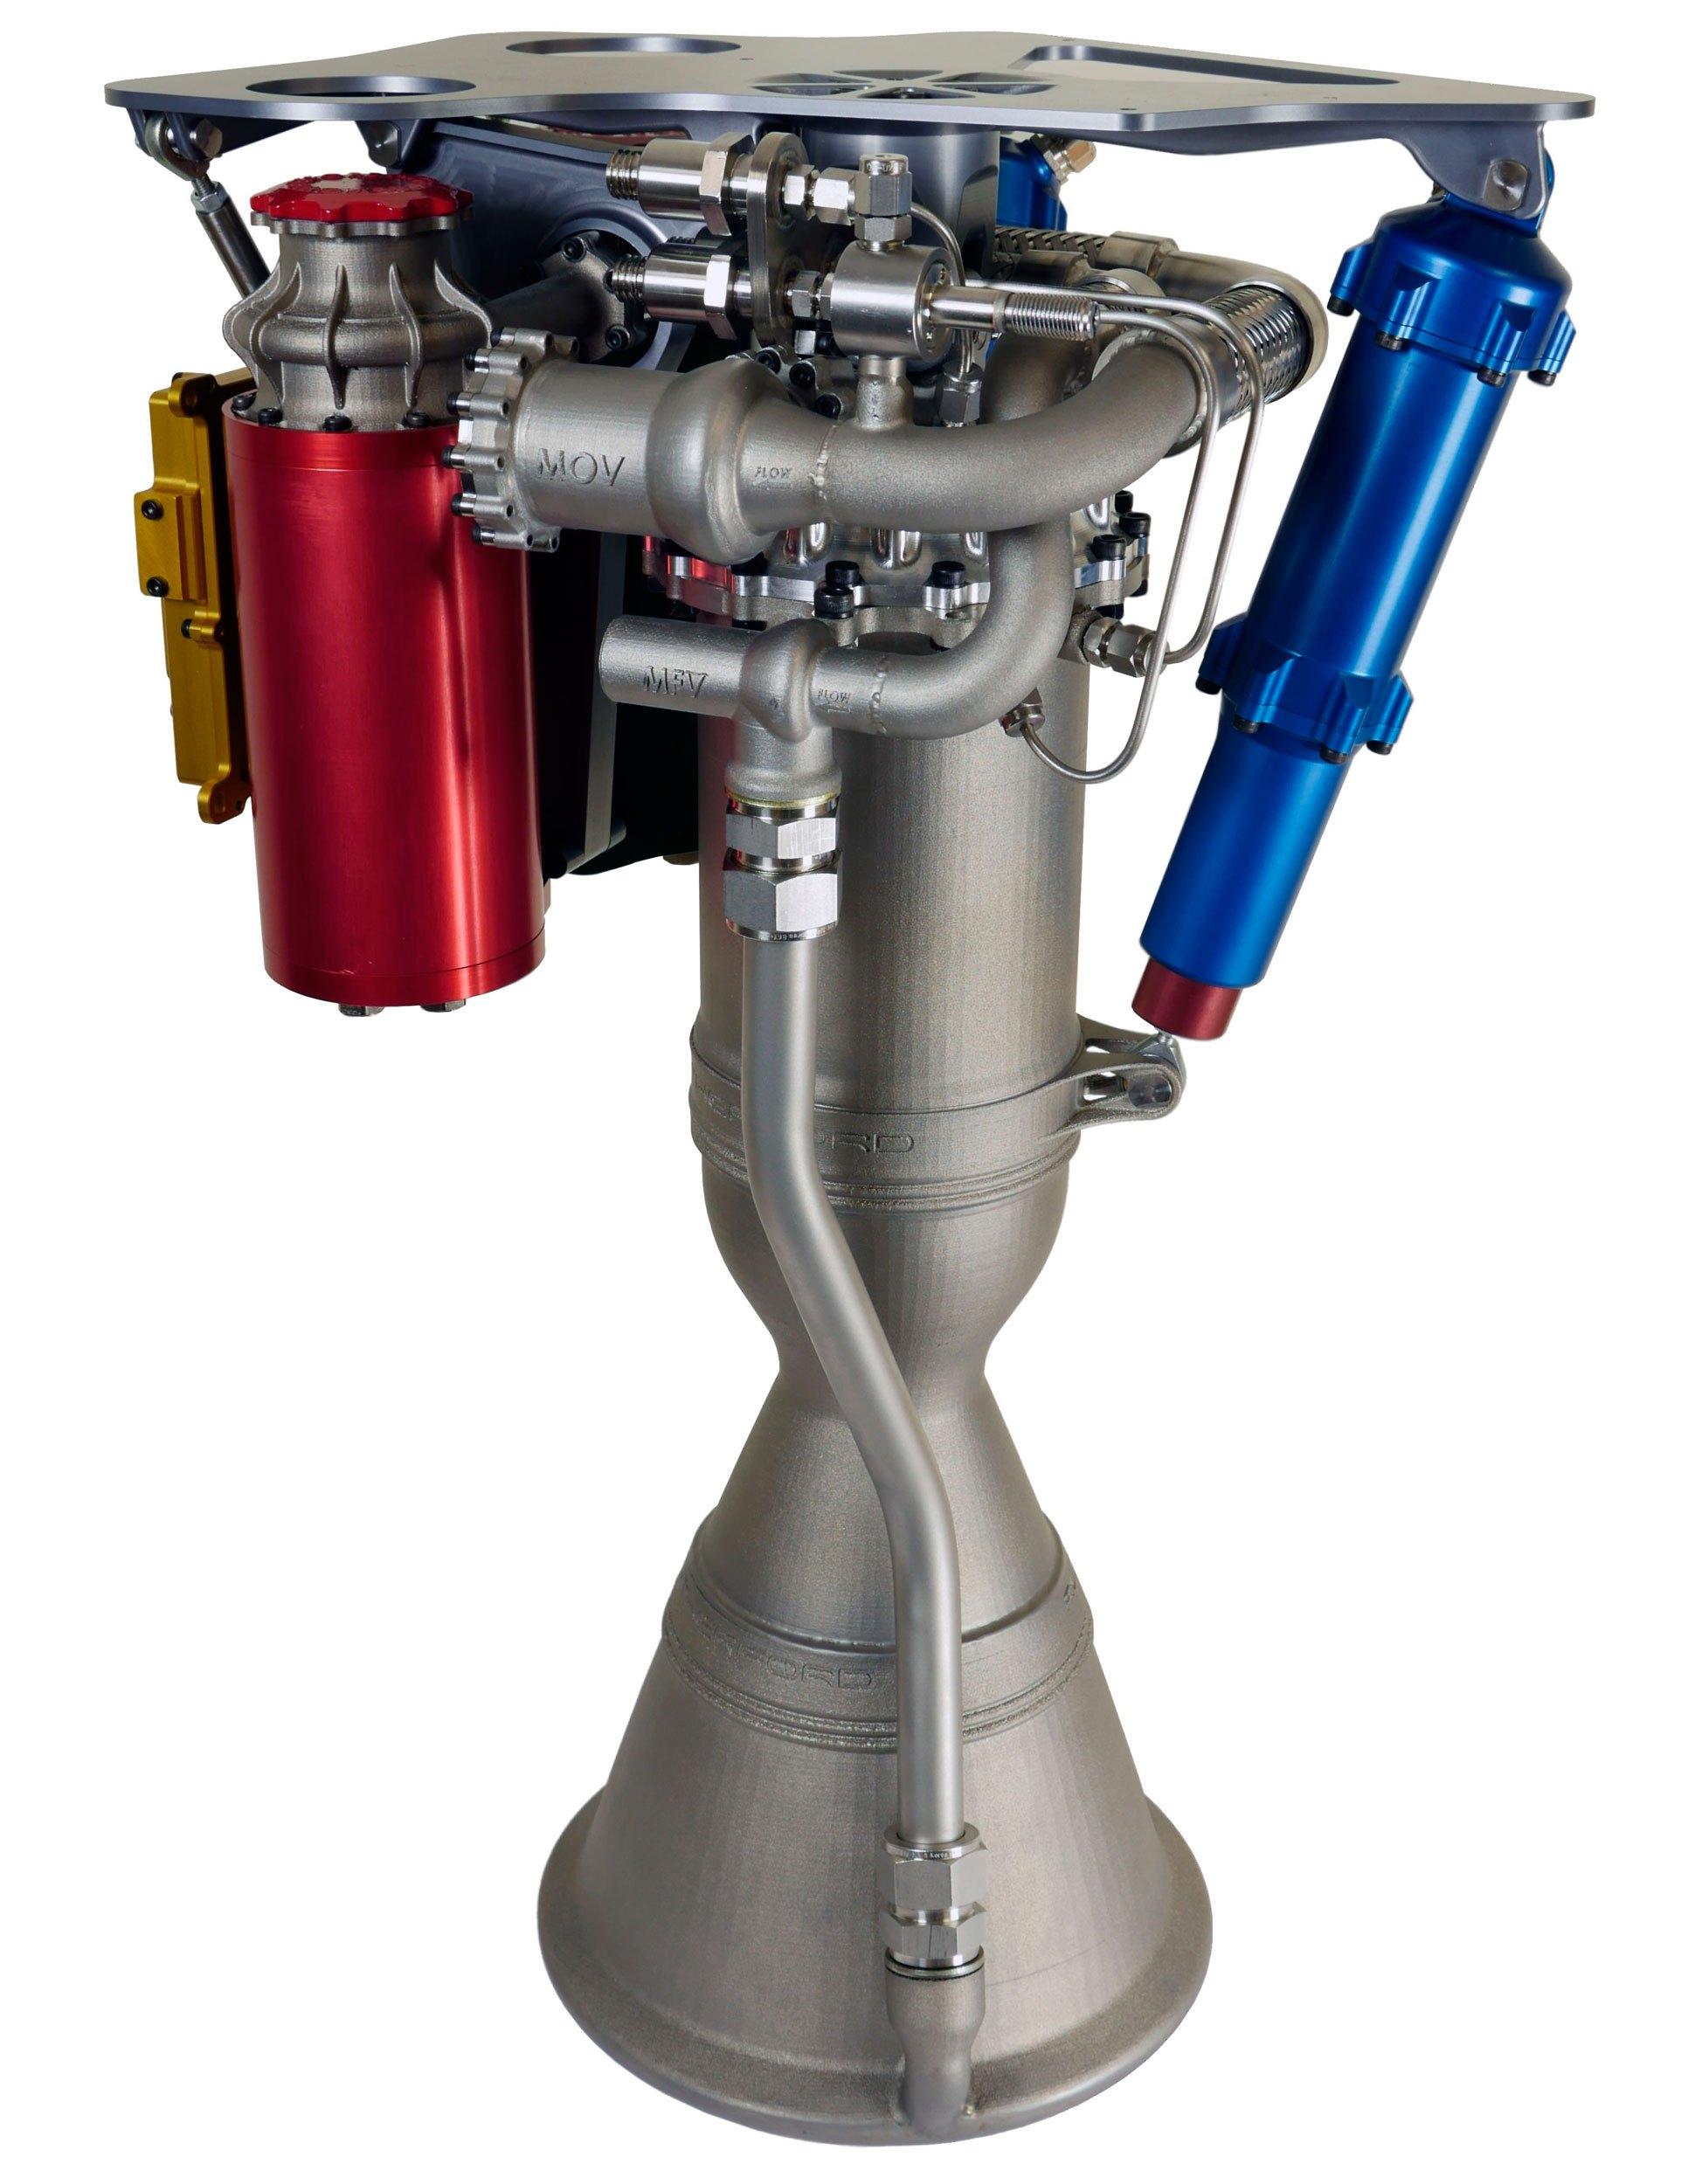 Motor Rutherford. Zdroj: http://spaceflight101.com/